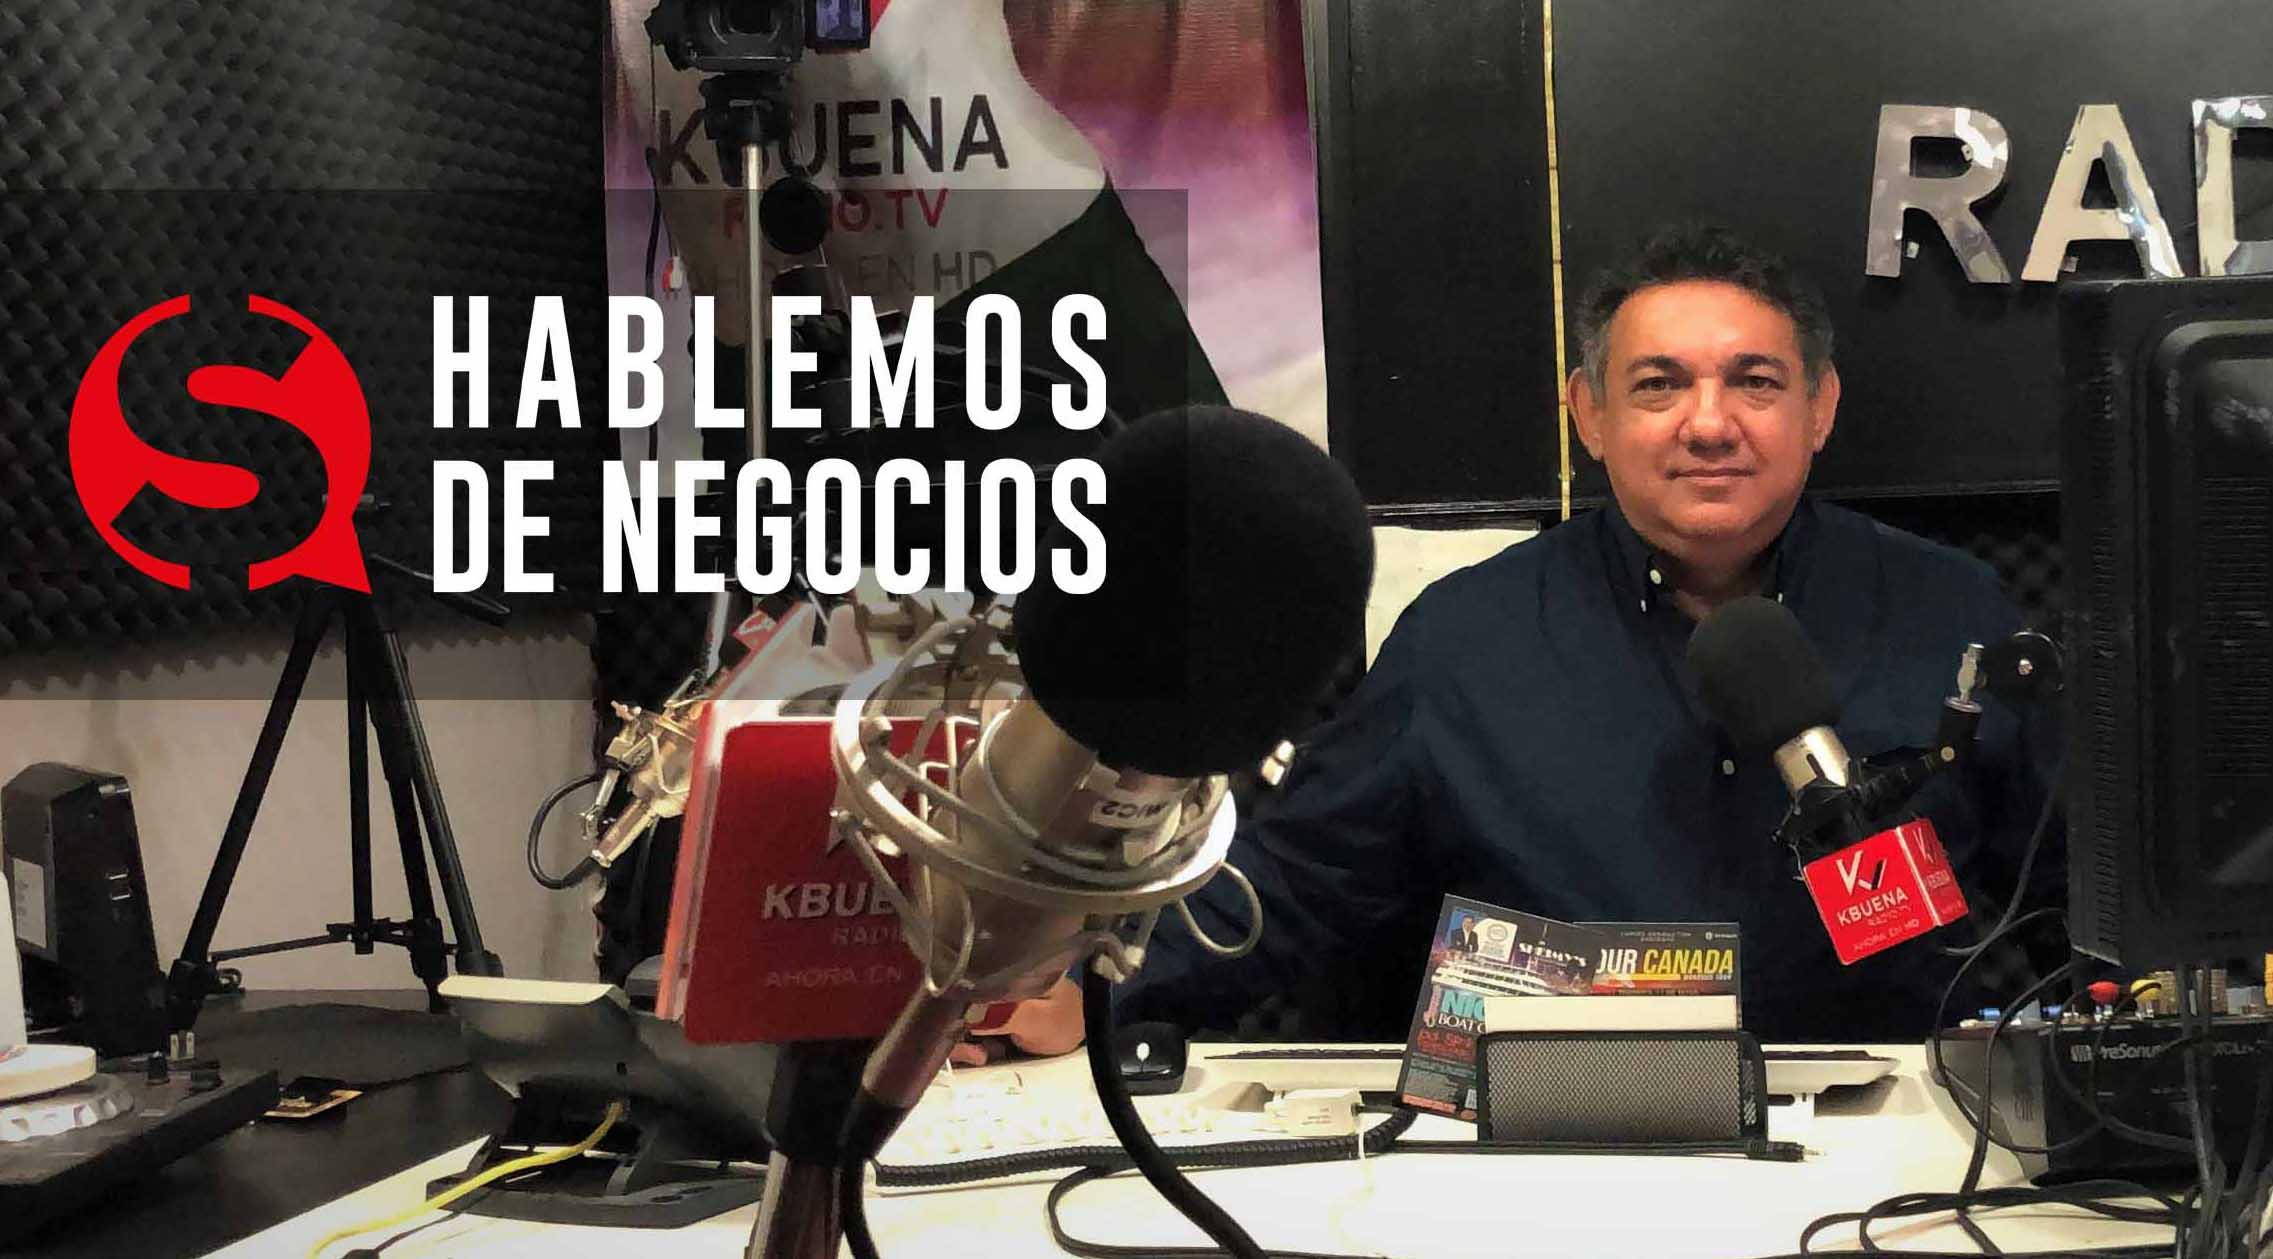 alfonso Parra Naissir - Hablemos de Negocios